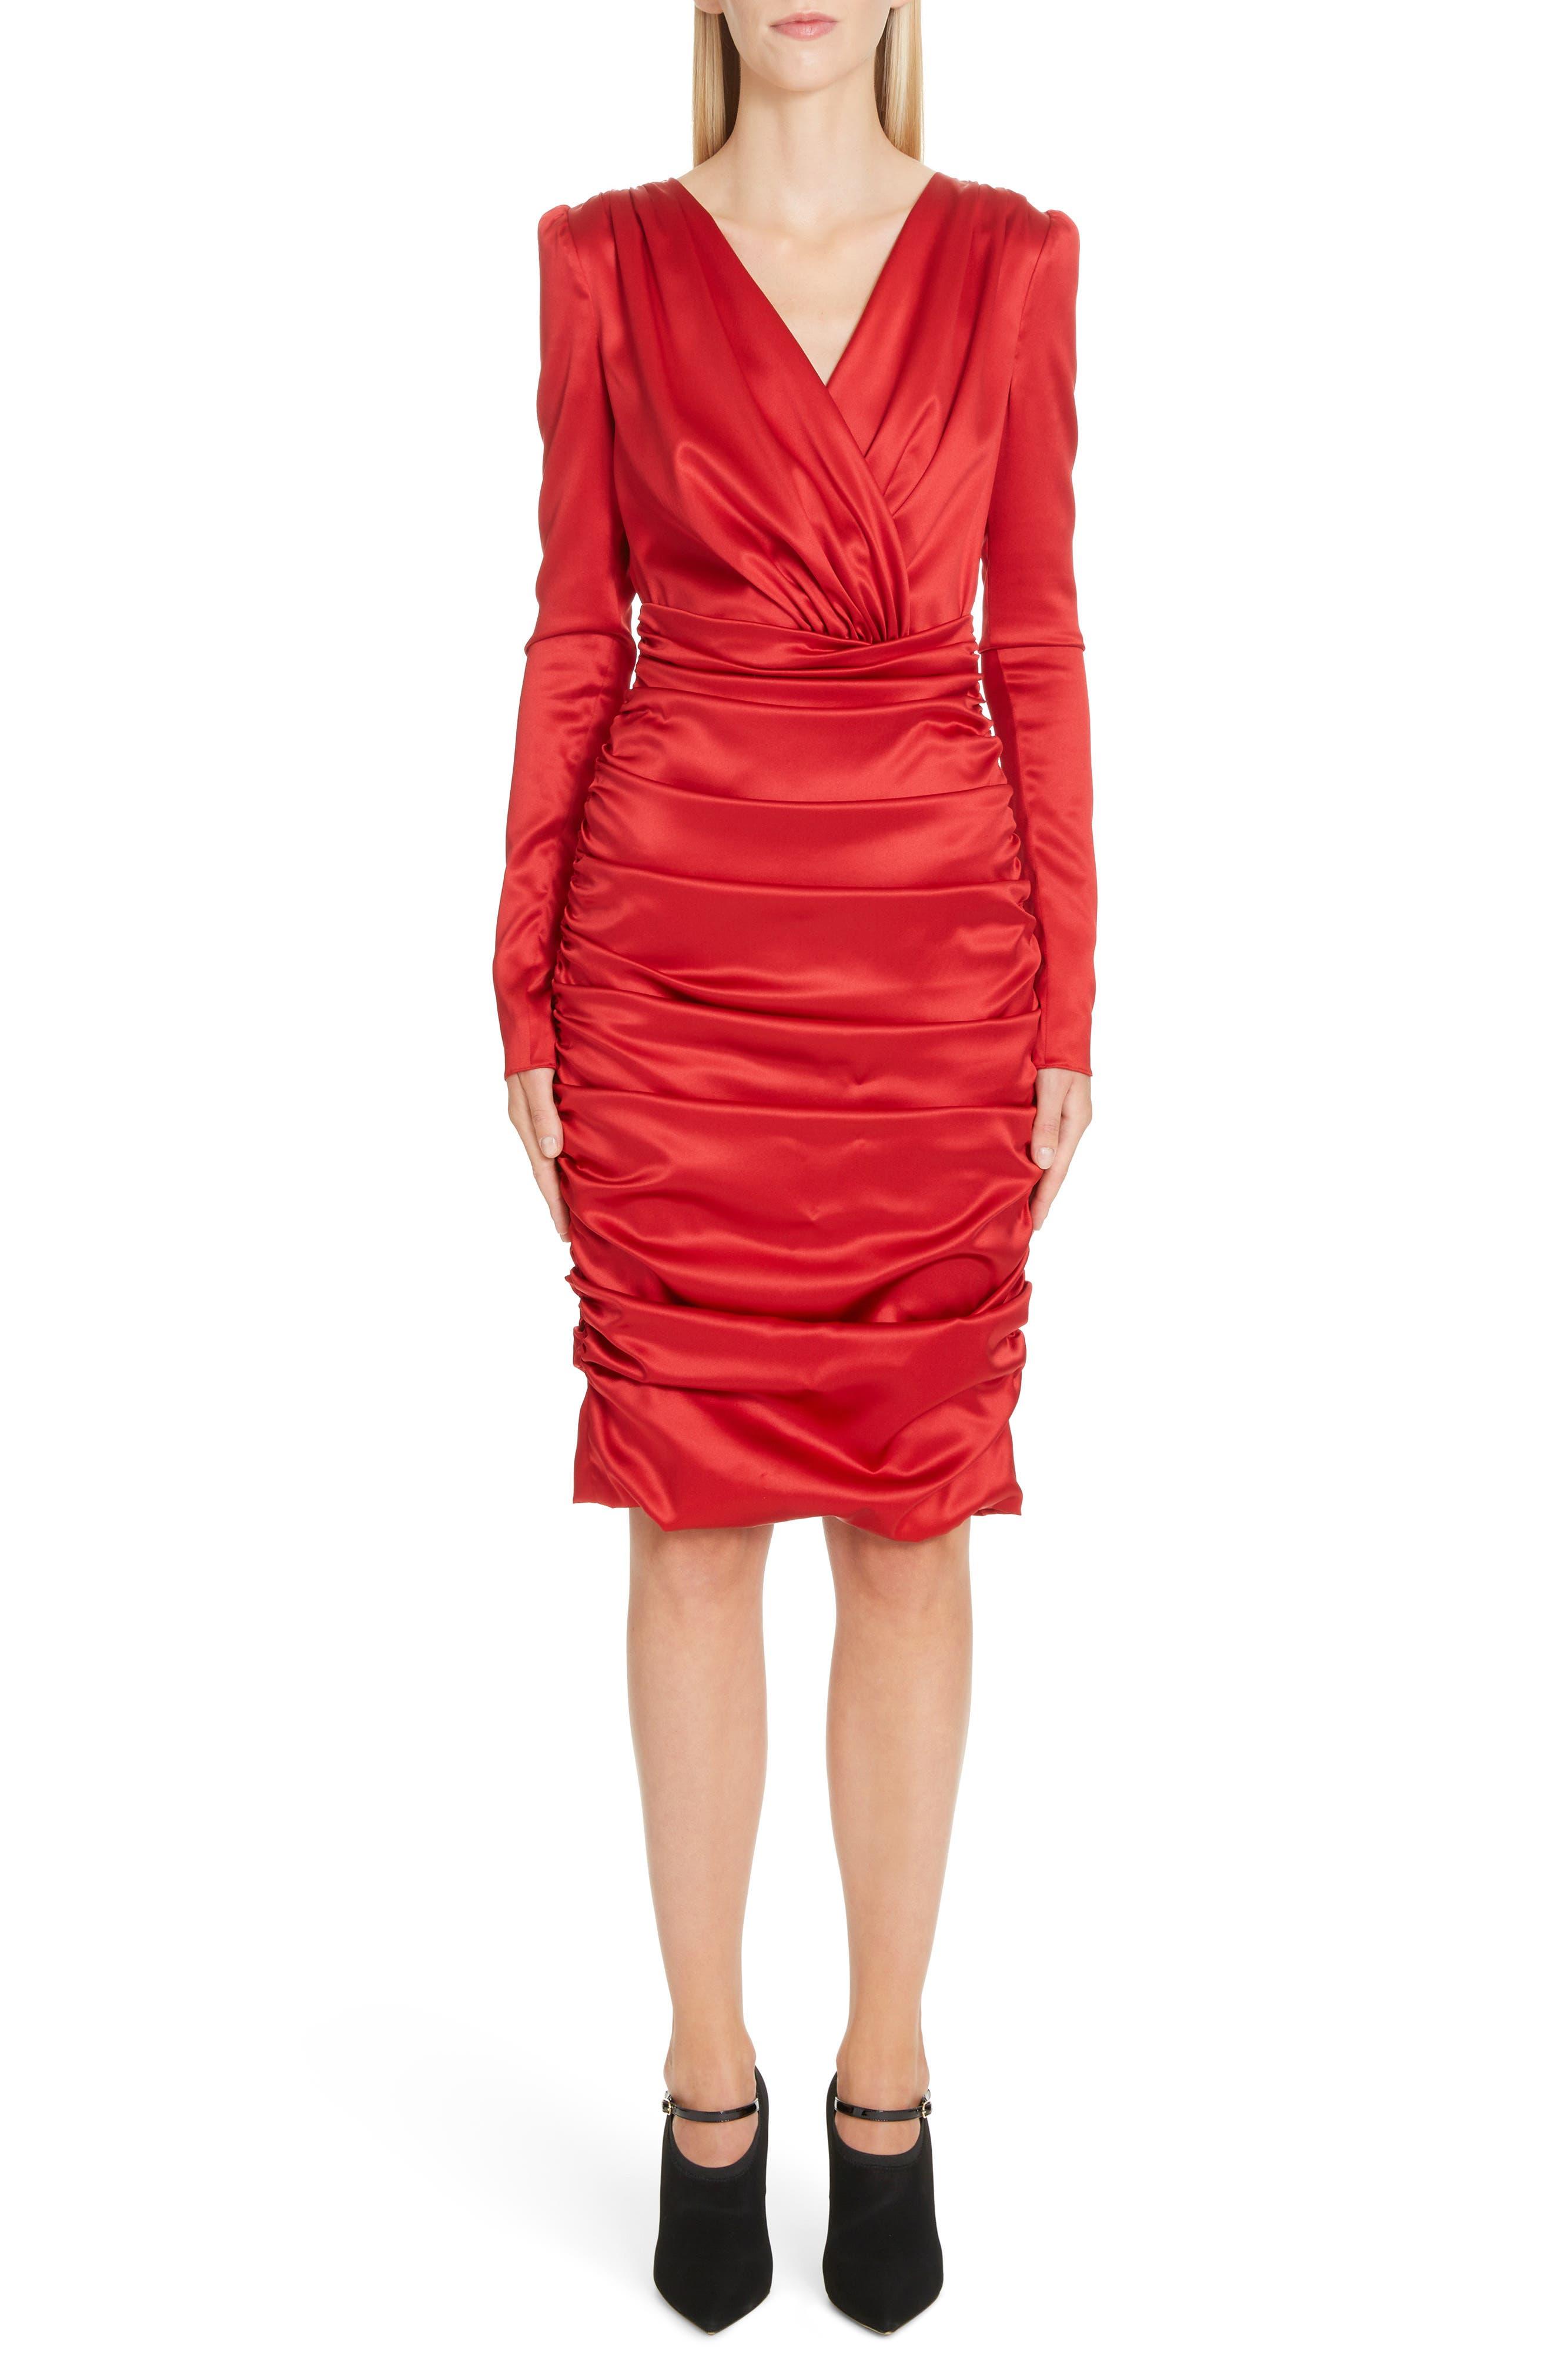 Dolce & gabbana Stretch Silk Satin Sheath Dress, US / 48 IT - Red